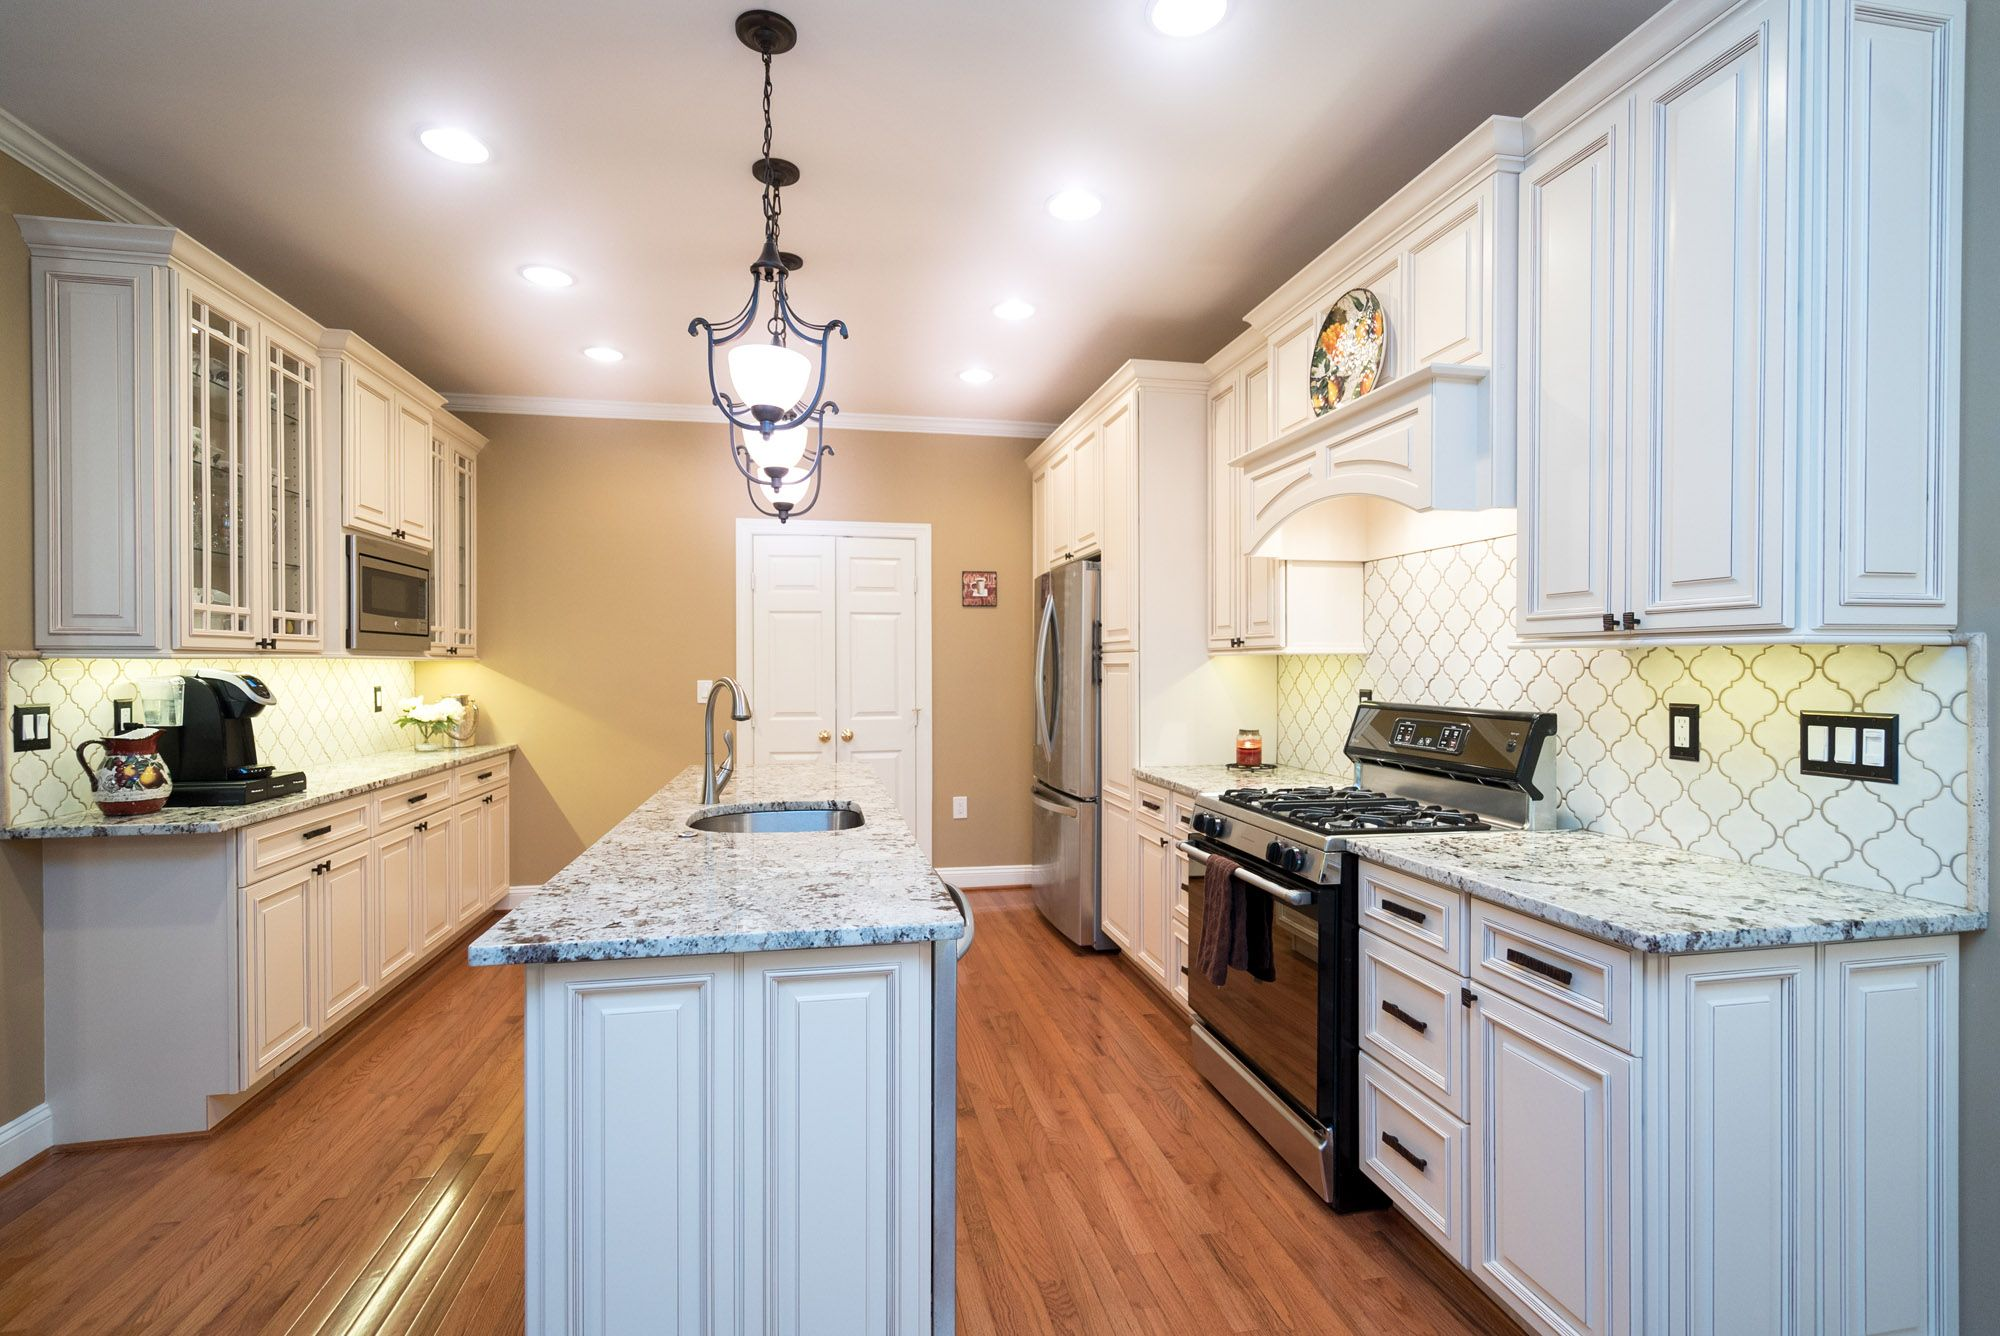 Kitchen remodeling in Leesburg, VA Kitchen